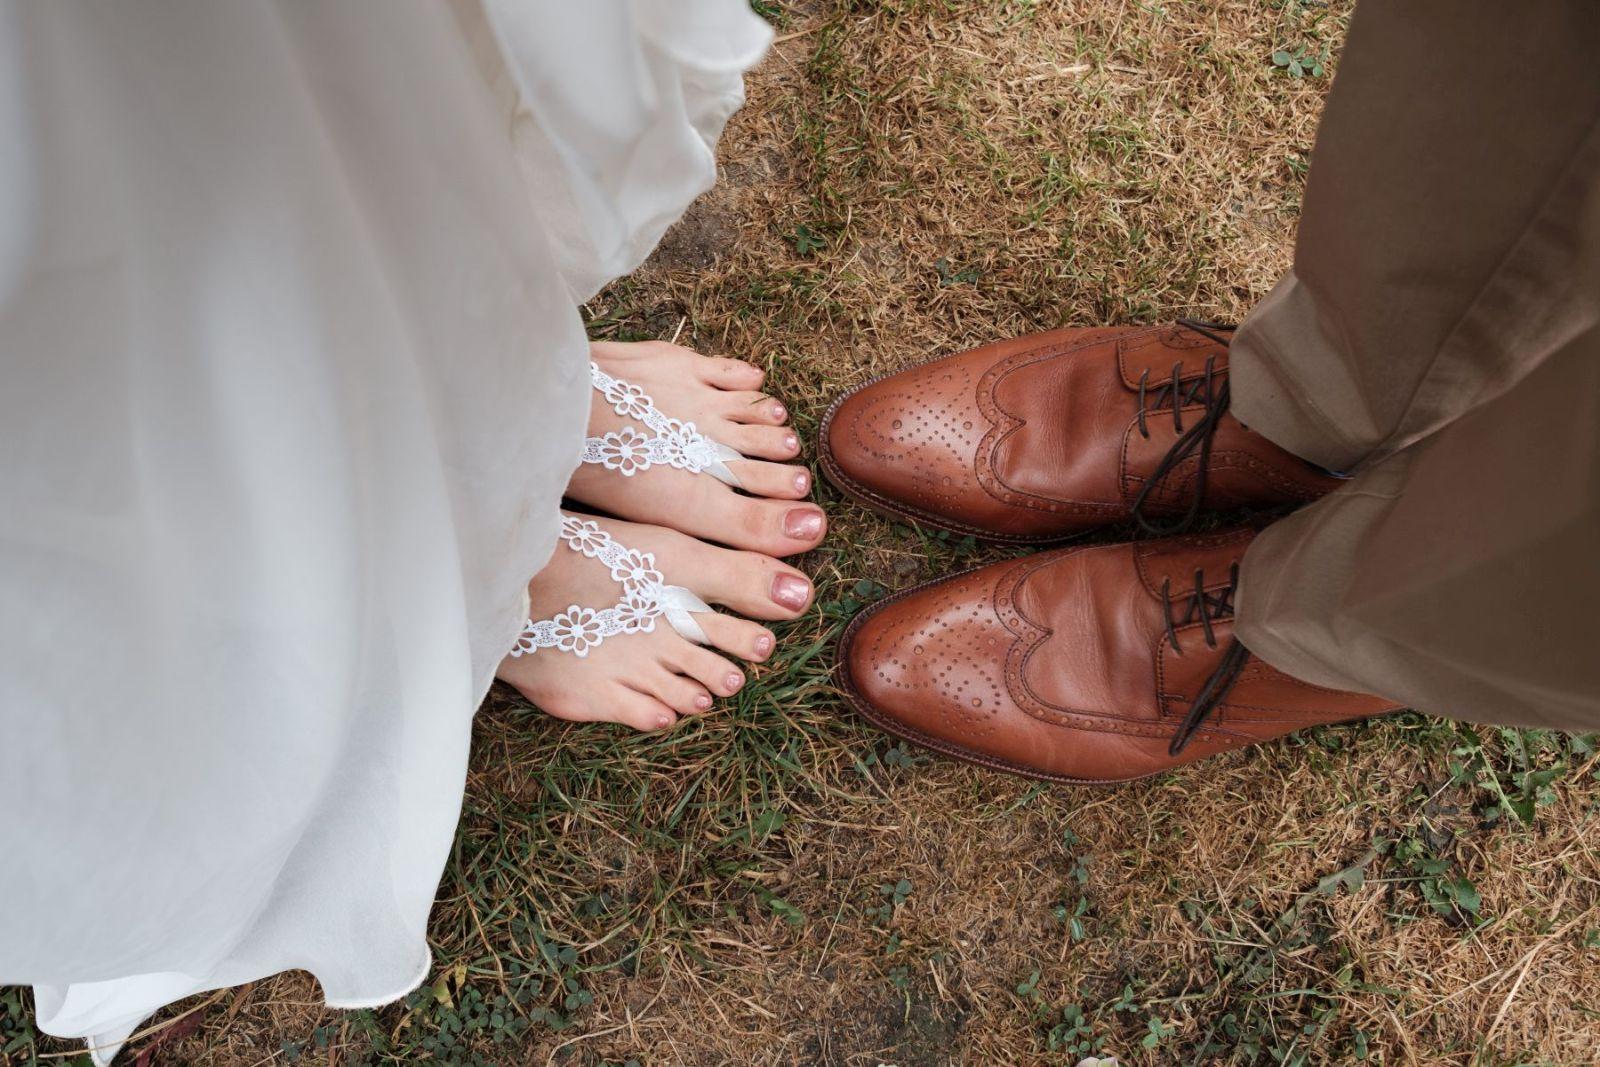 Hanca Luky Svatba Jako Hudebni Festival Wedding Factory Svatebni Agentura Praha